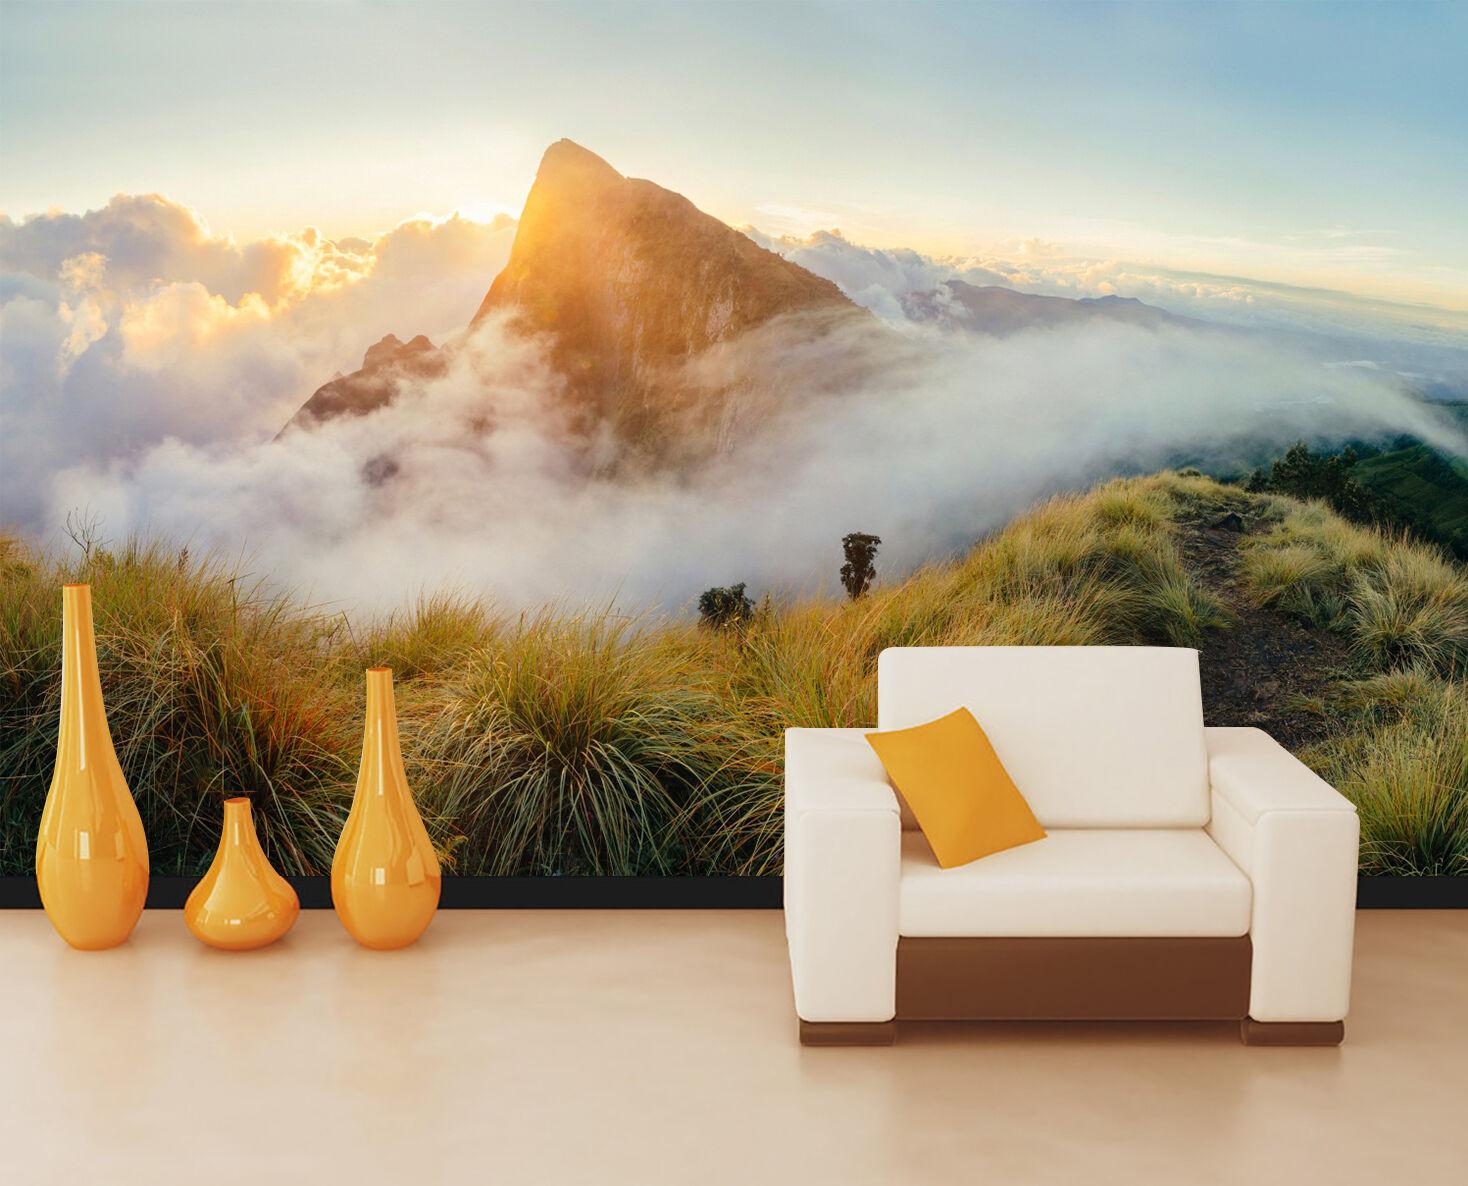 3D Wolken, Berge 34 Fototapeten Wandbild Bild Tapete Familie Kinder